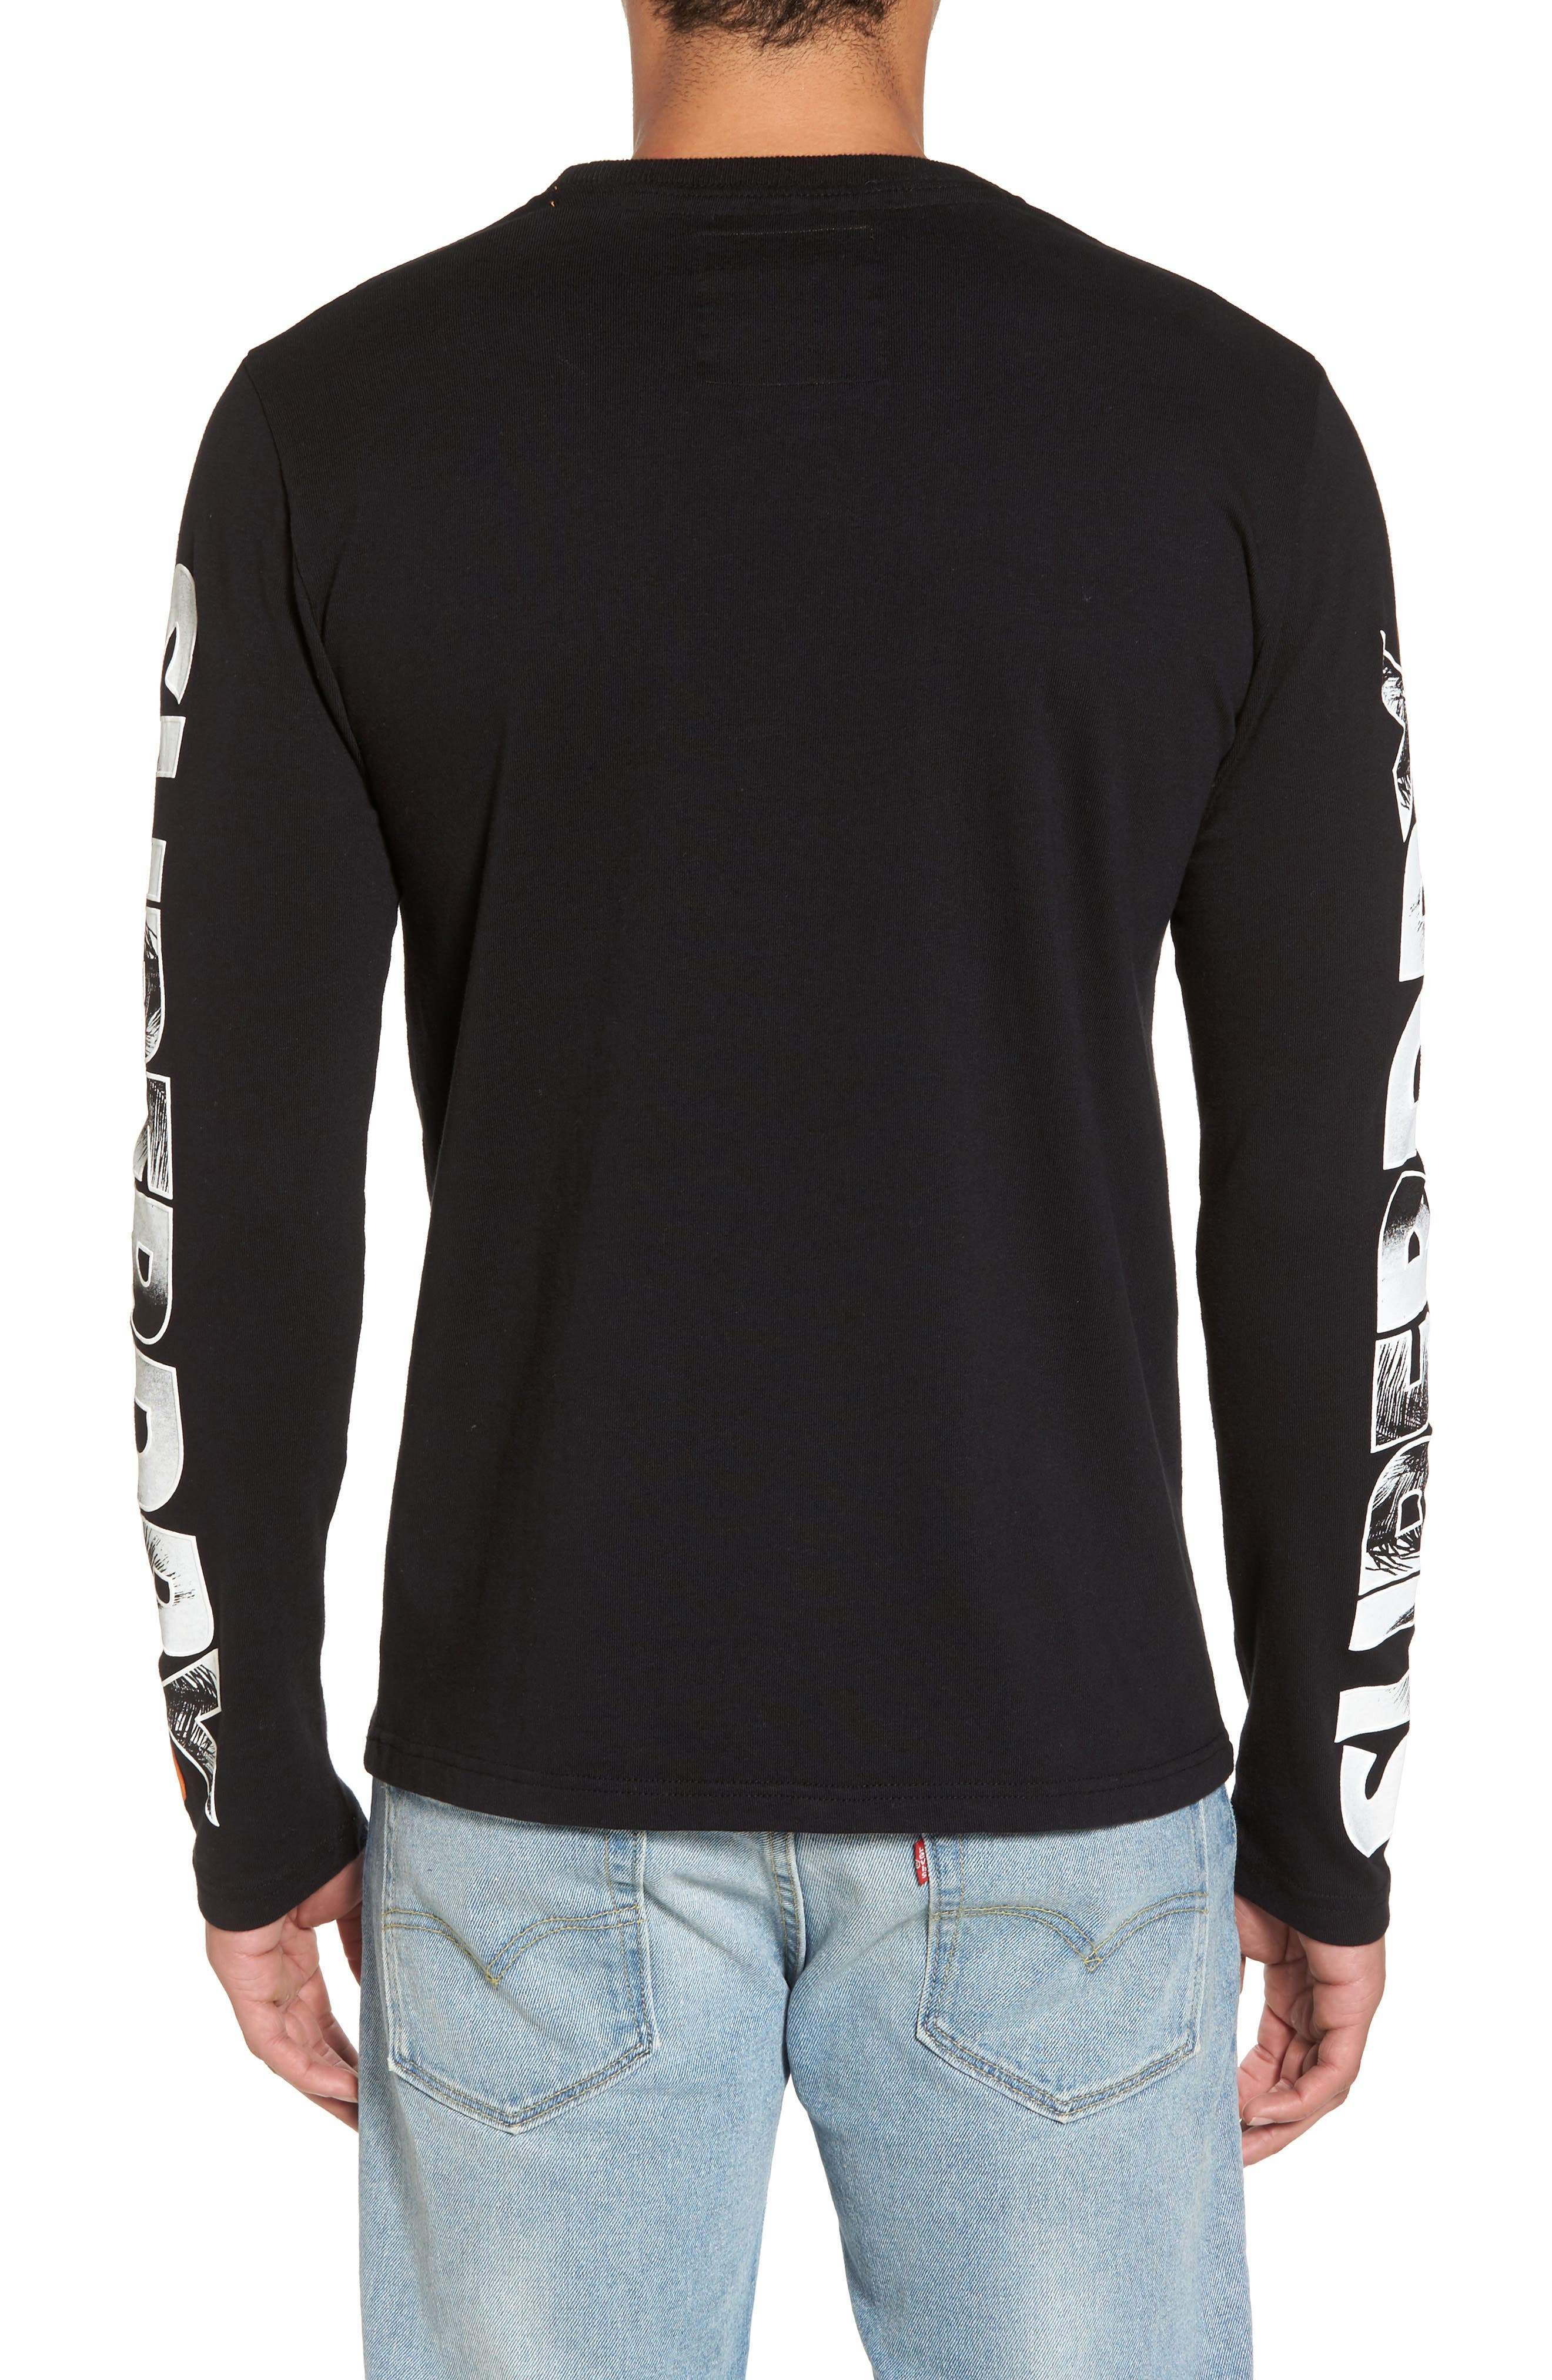 Hyper T-Shirt,                             Alternate thumbnail 2, color,                             Black